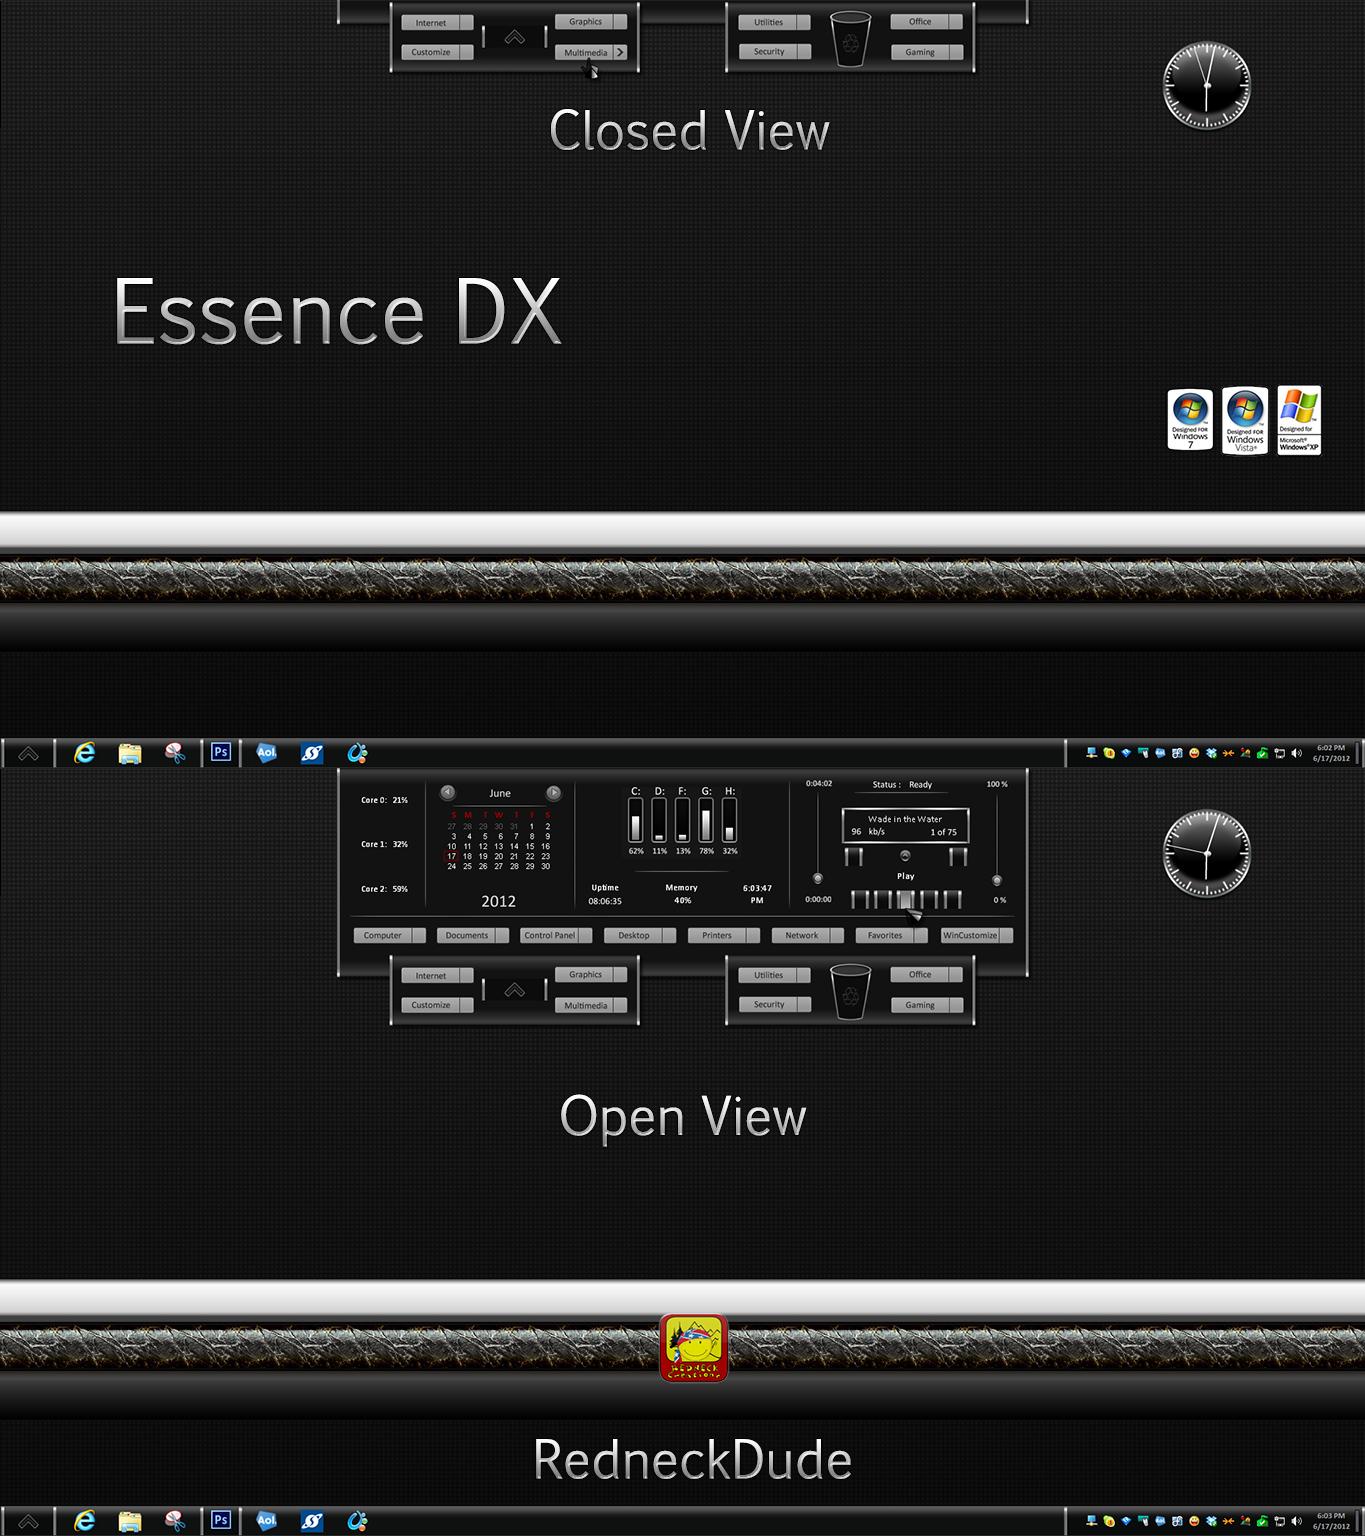 Essence DX